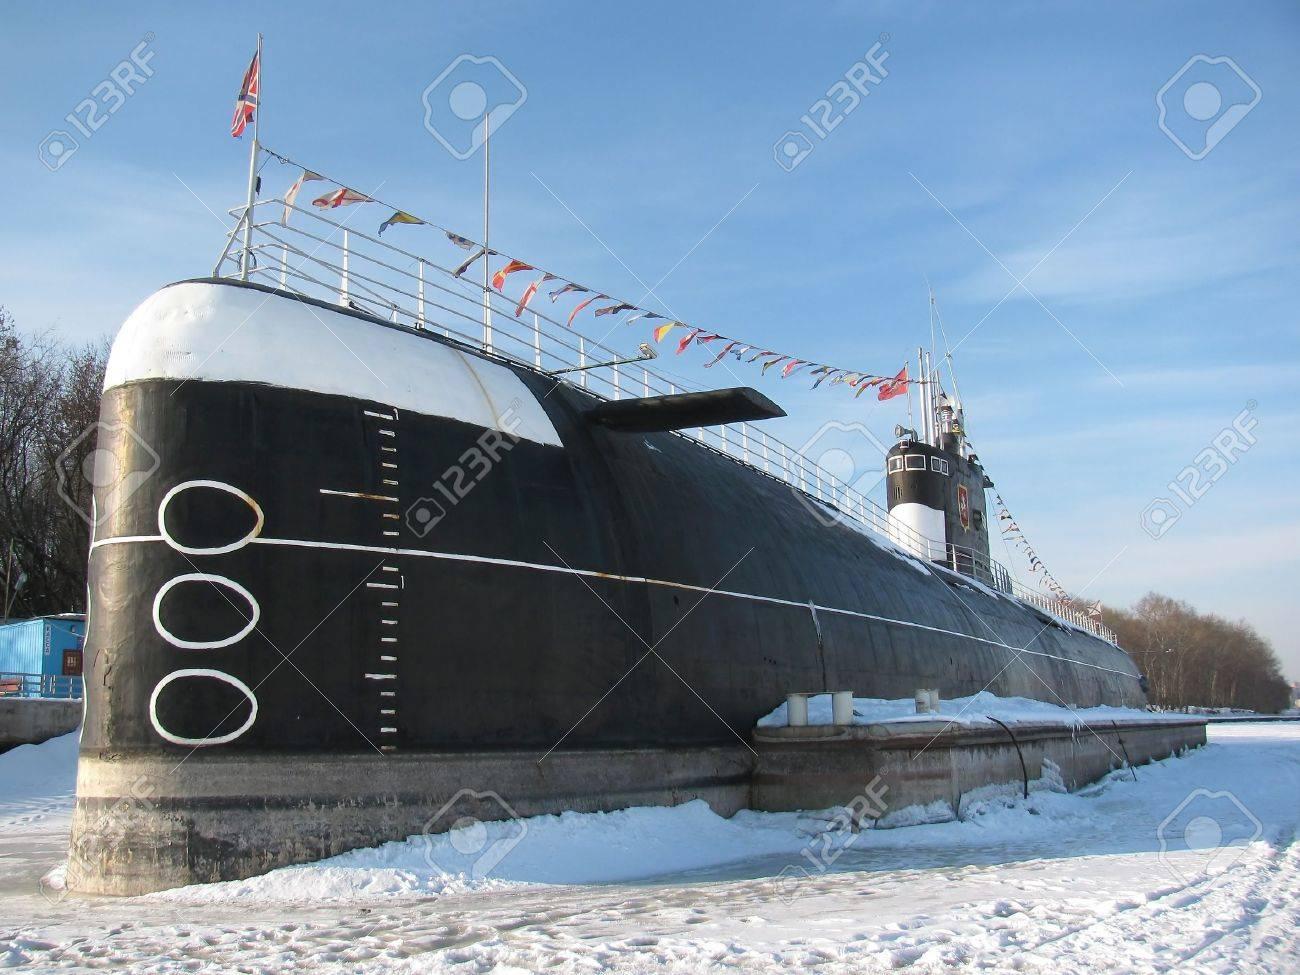 Submarine in dock. Frozen in ice - 4424998